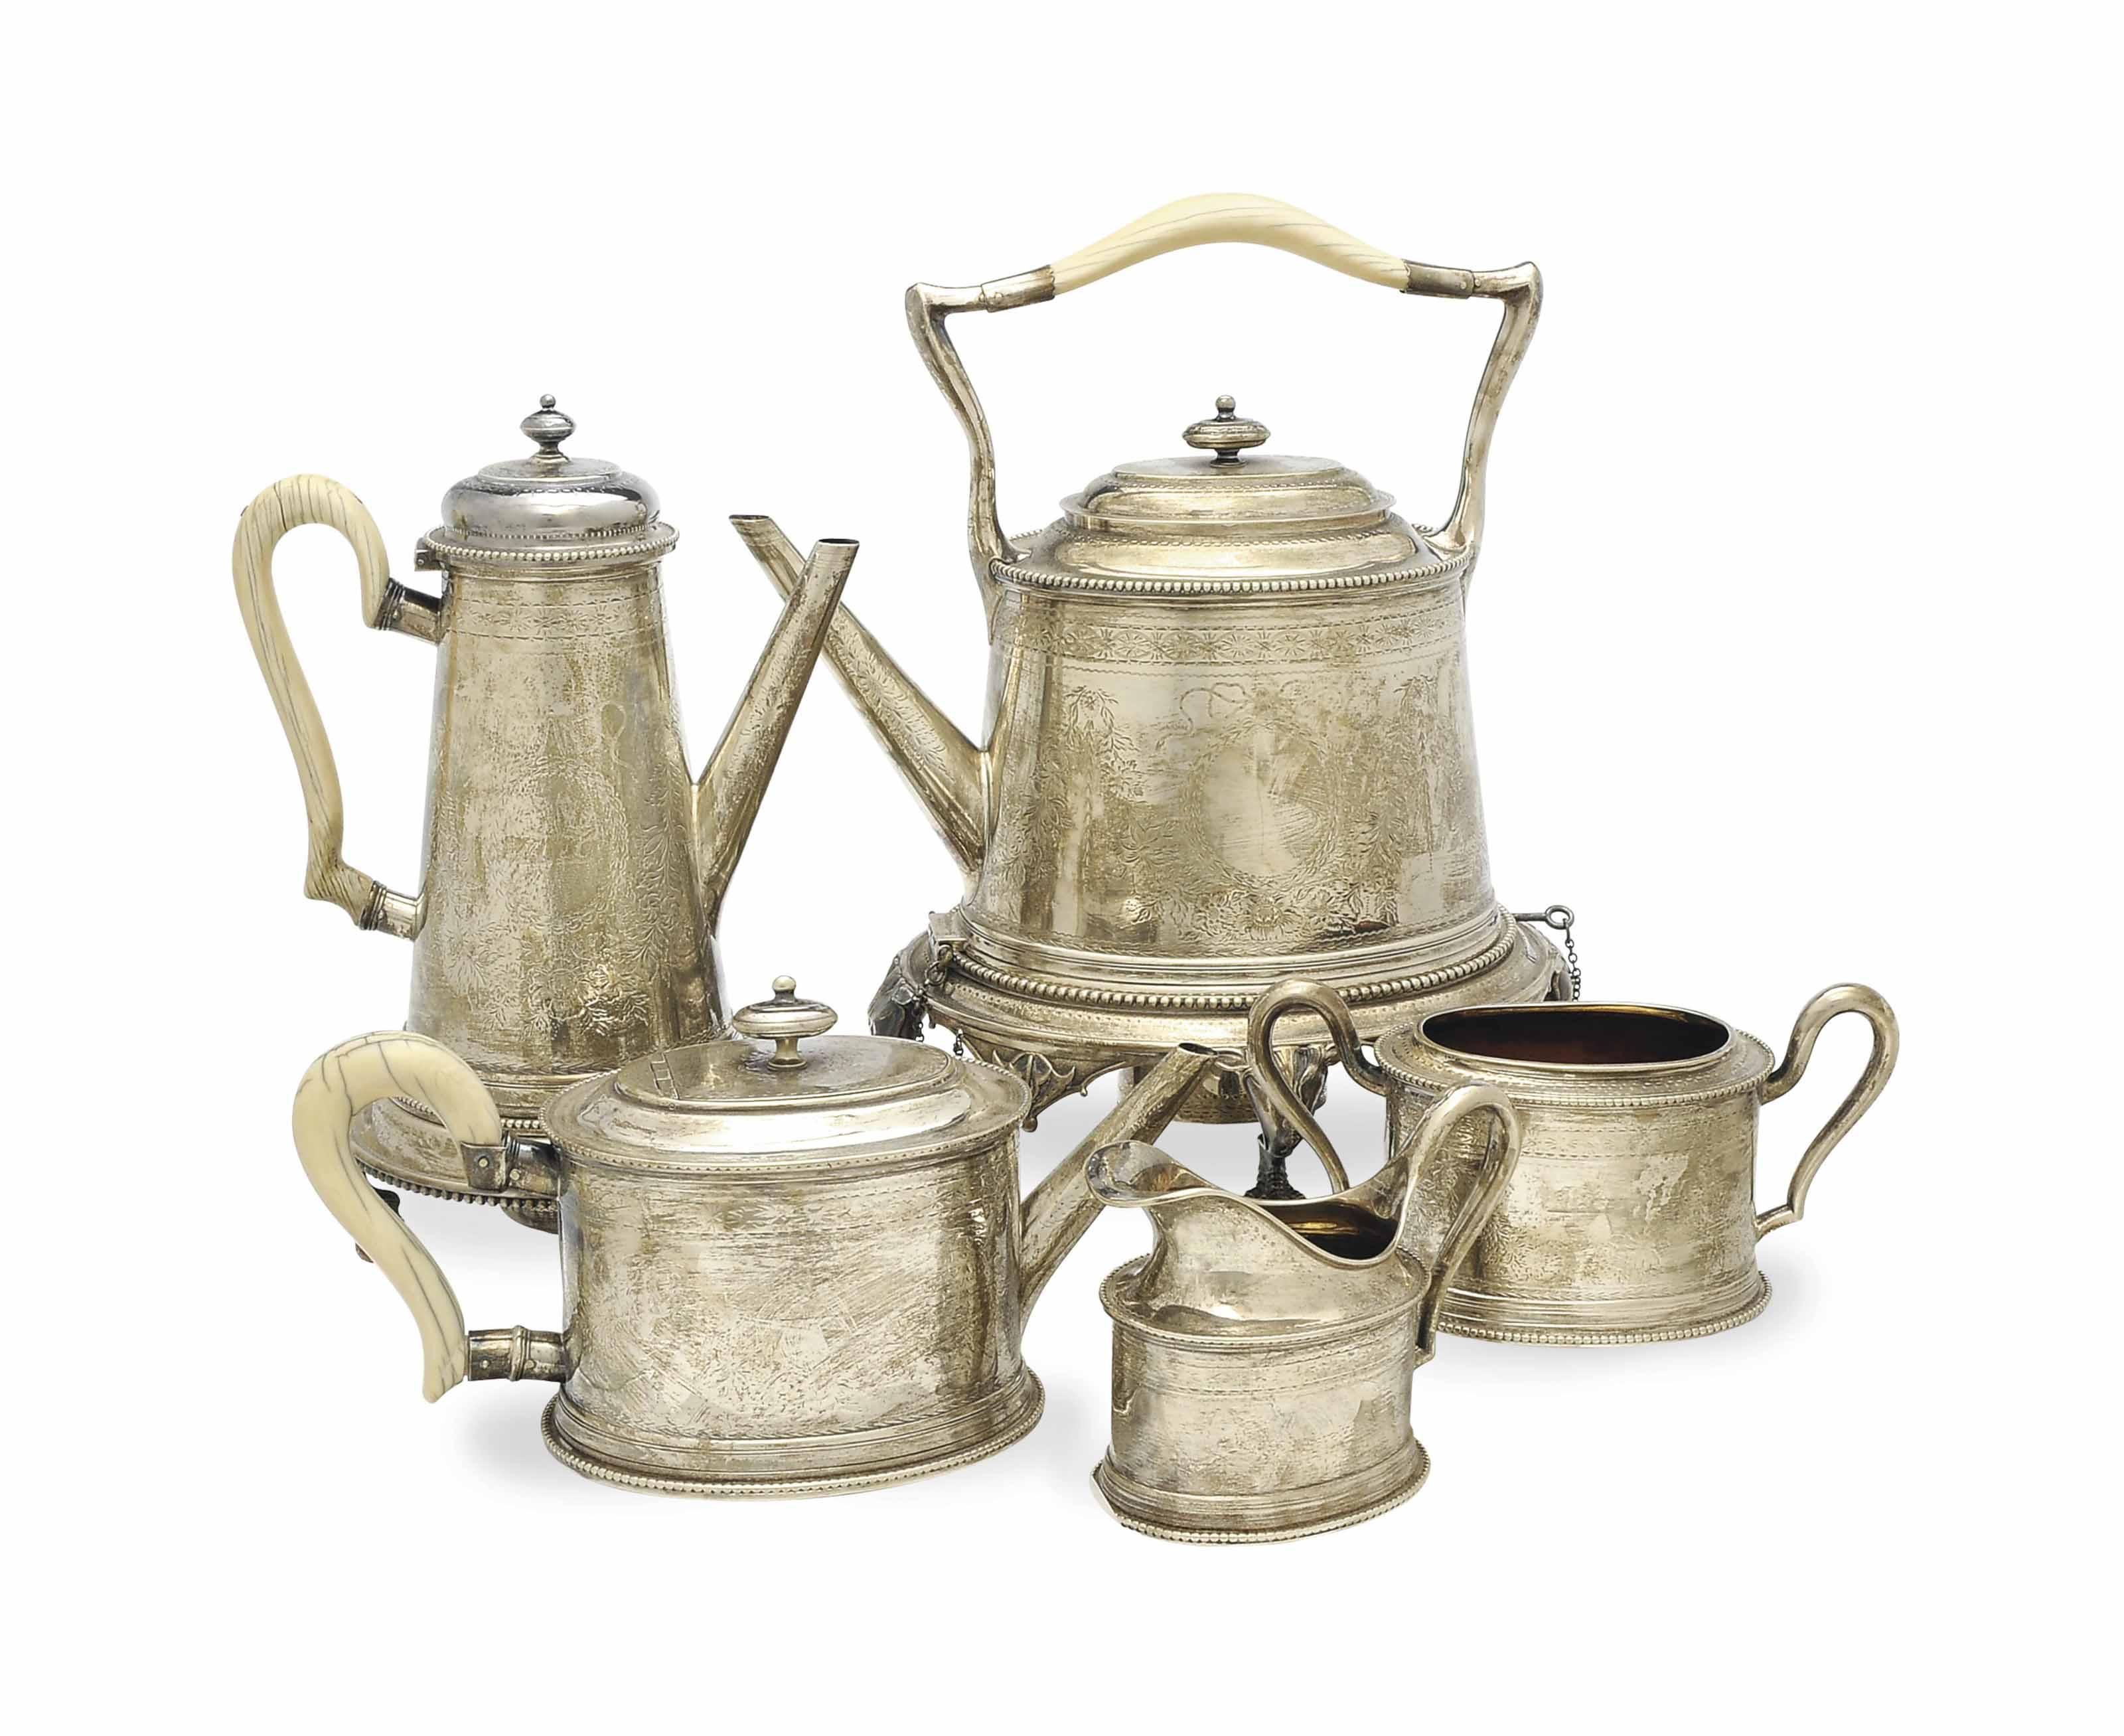 A VICTORIAN SILVER FIVE-PIECE TEA AND COFFEE SERVICE,